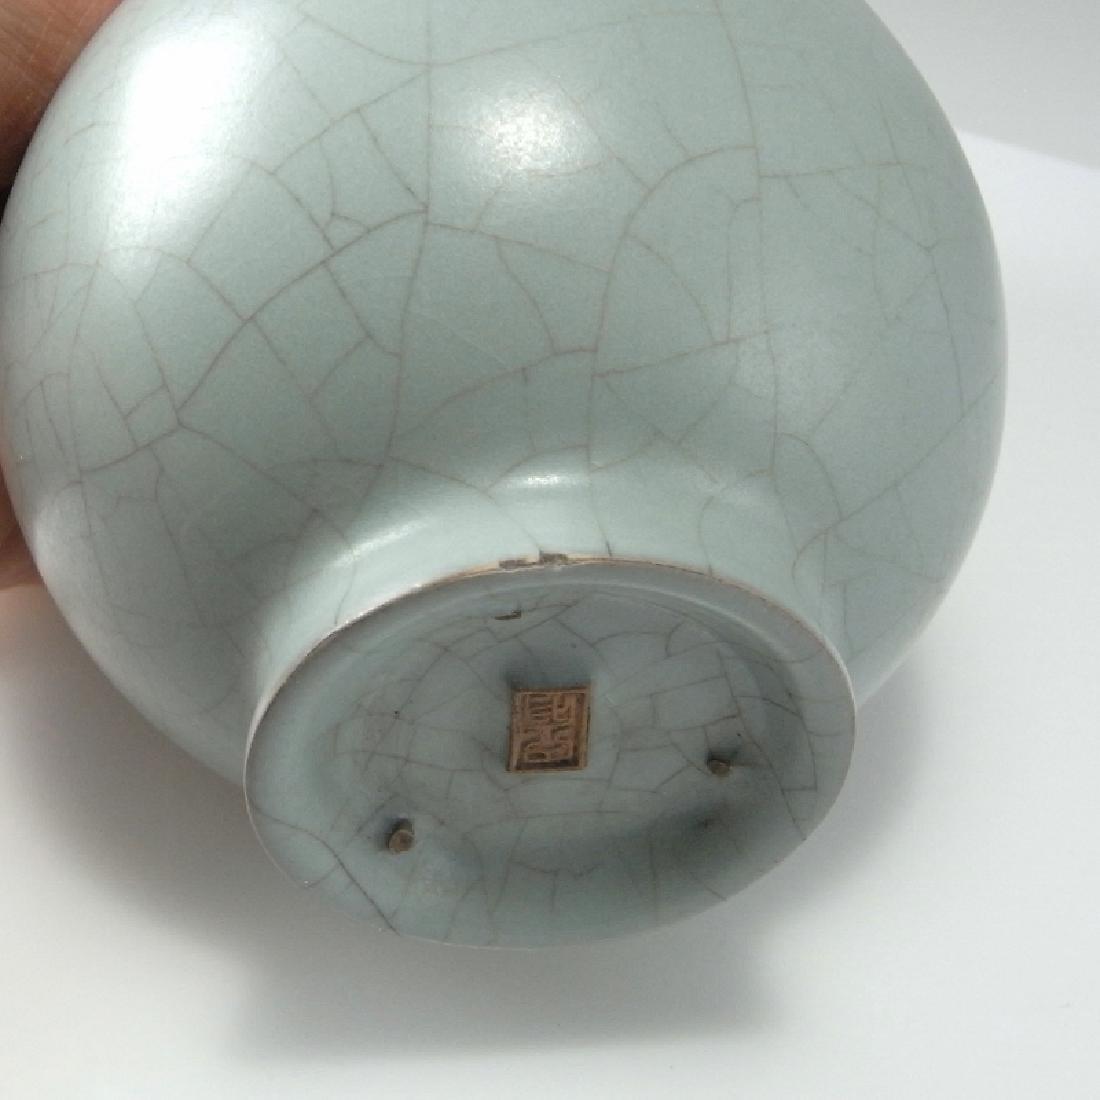 Song Dynasty Guan Monochome Glaze Vase - 3